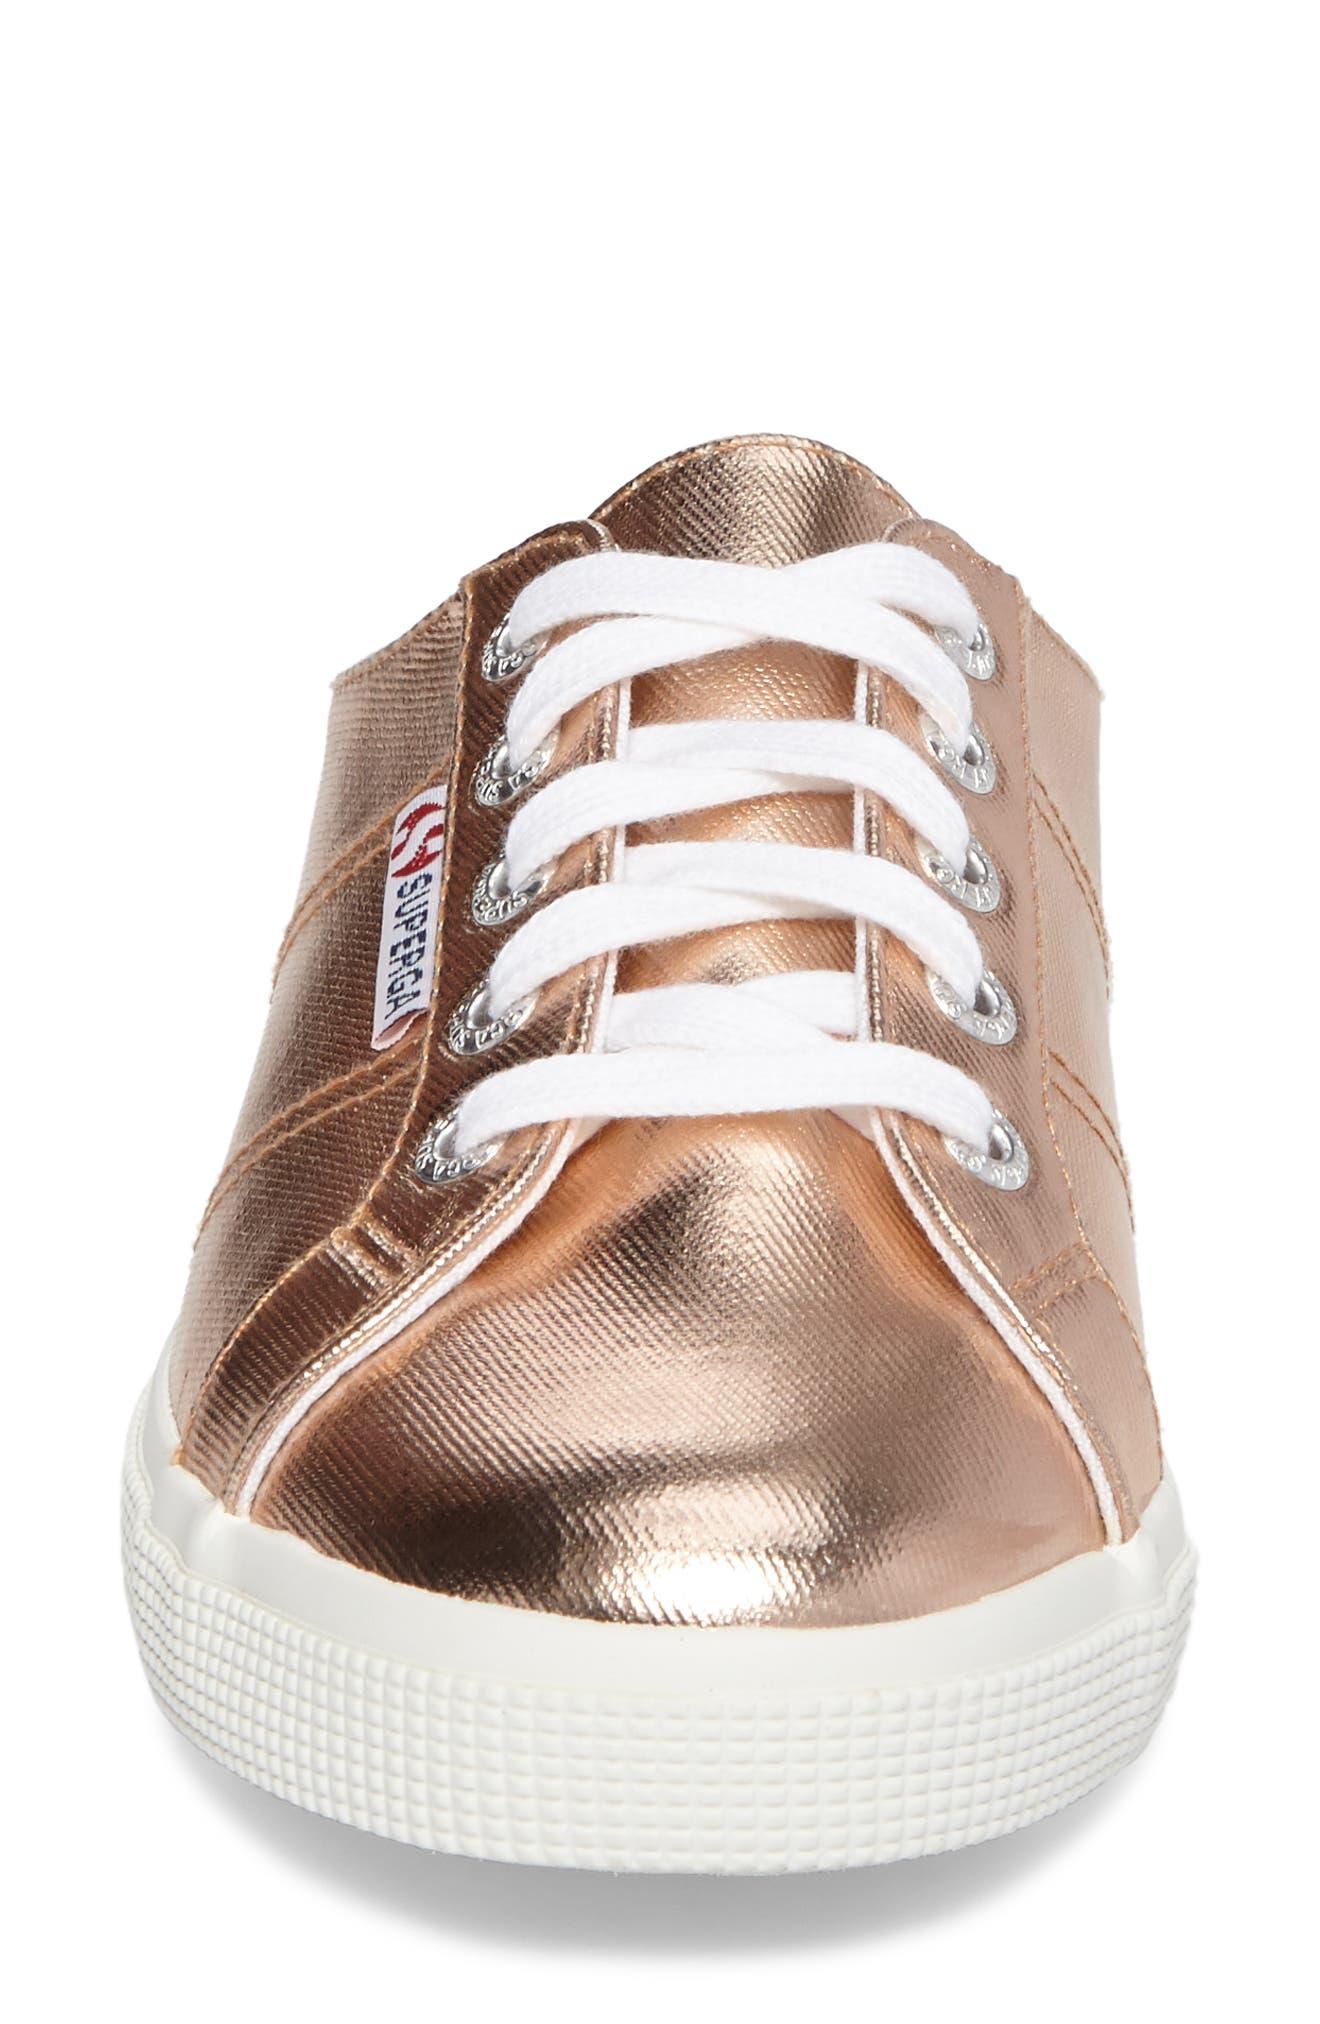 2288 Sneaker Mule,                             Alternate thumbnail 4, color,                             Rose Gold